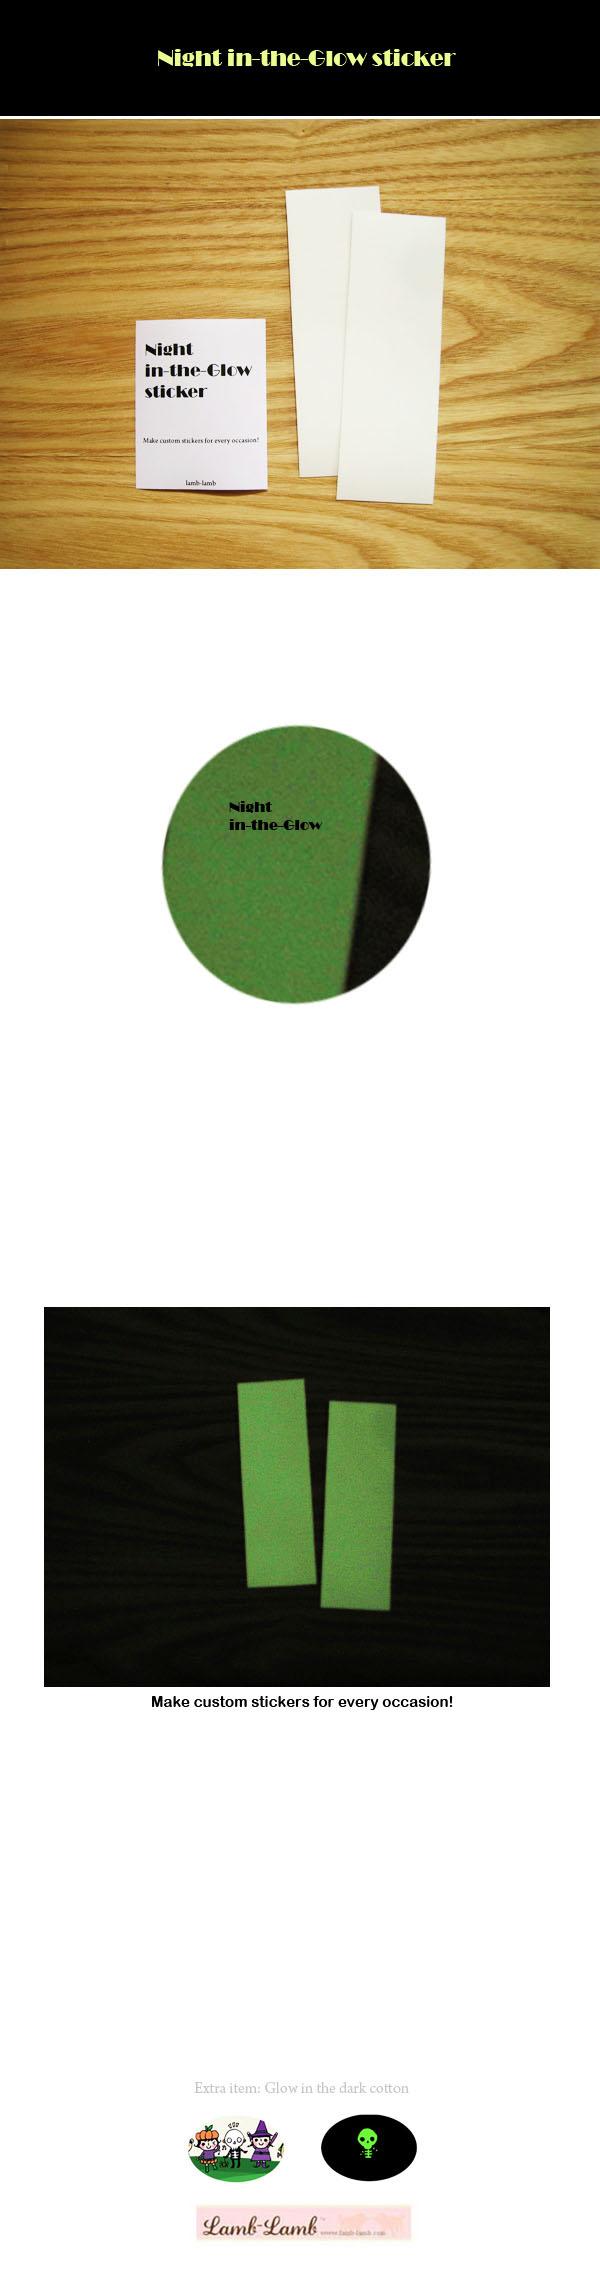 Night in the glow sticker - 램램, 3,000원, 스티커, 리폼/DIY스티커